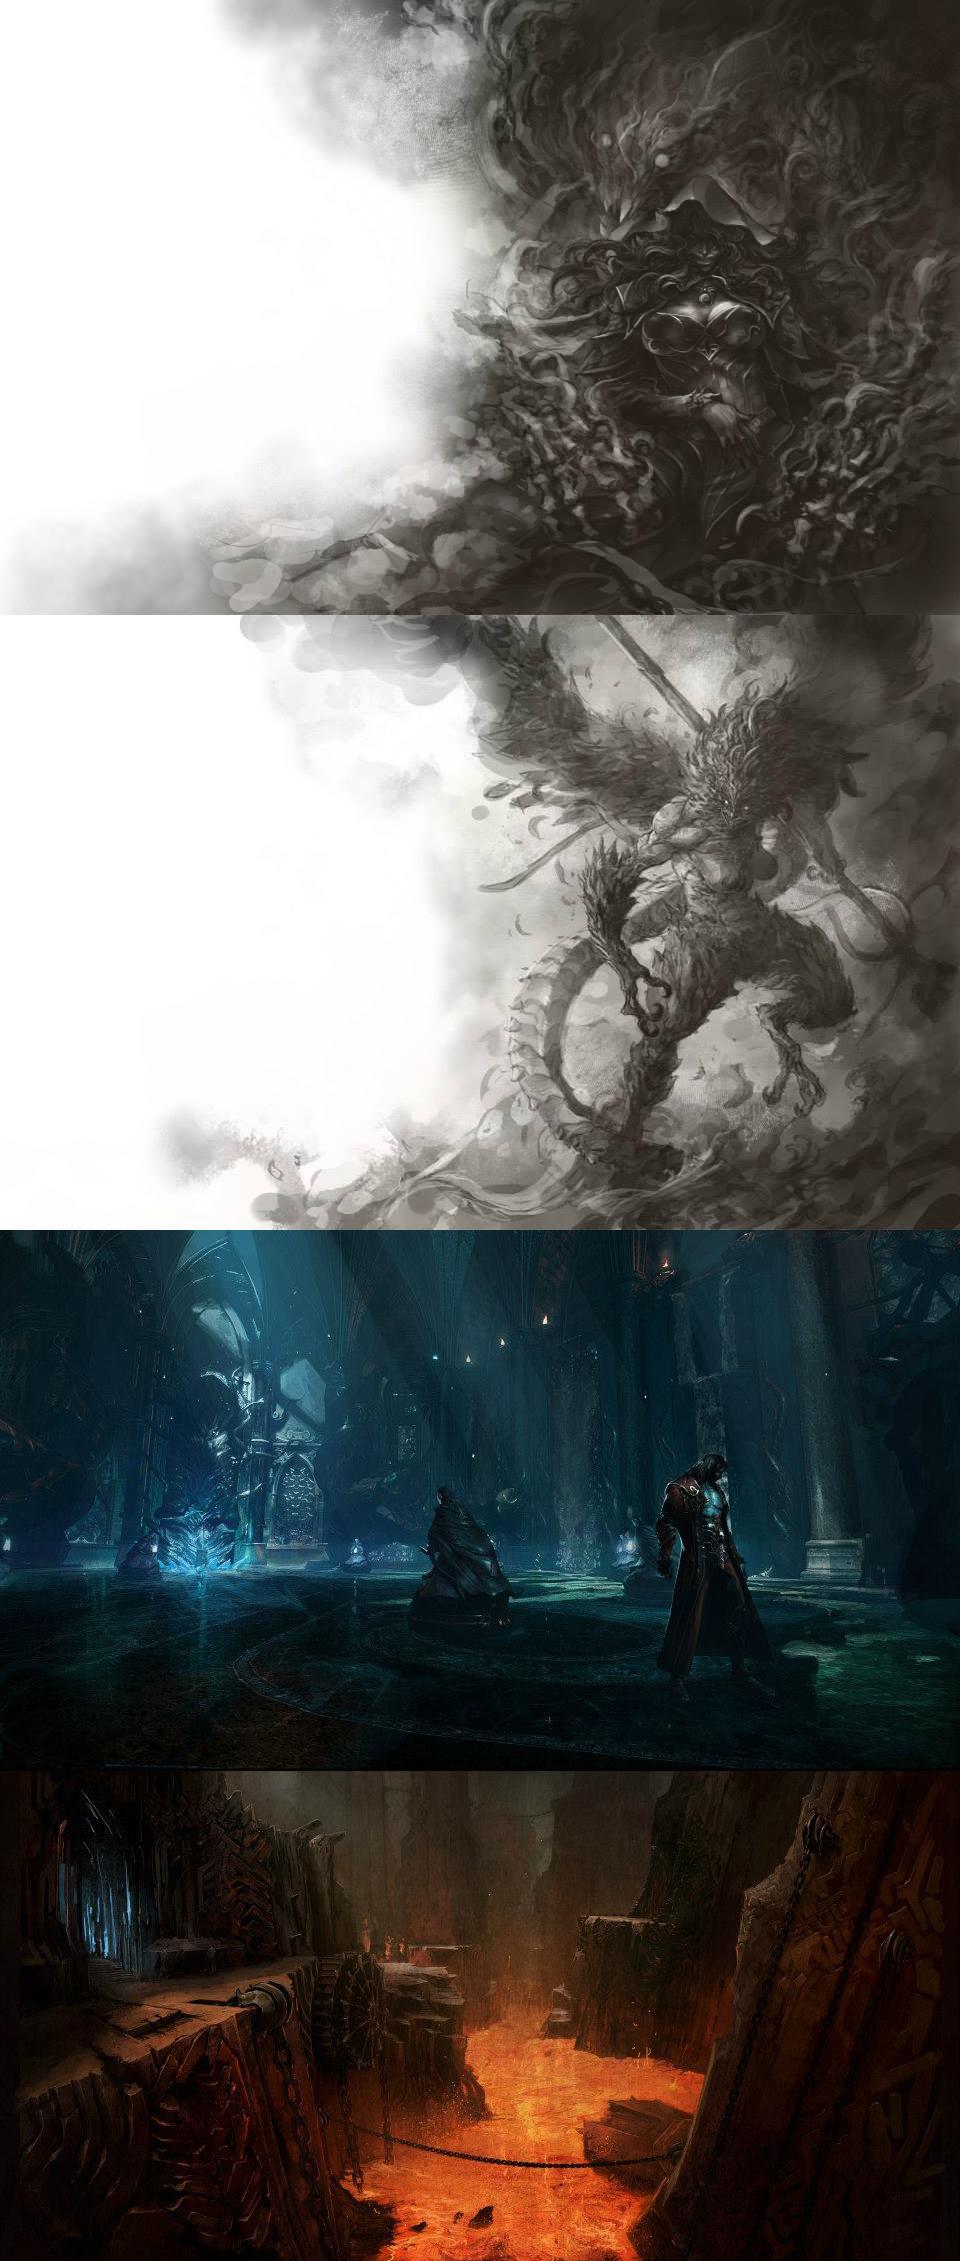 Tajemně krásné artworky z Castlevania: Lords of Shadow 2 86793